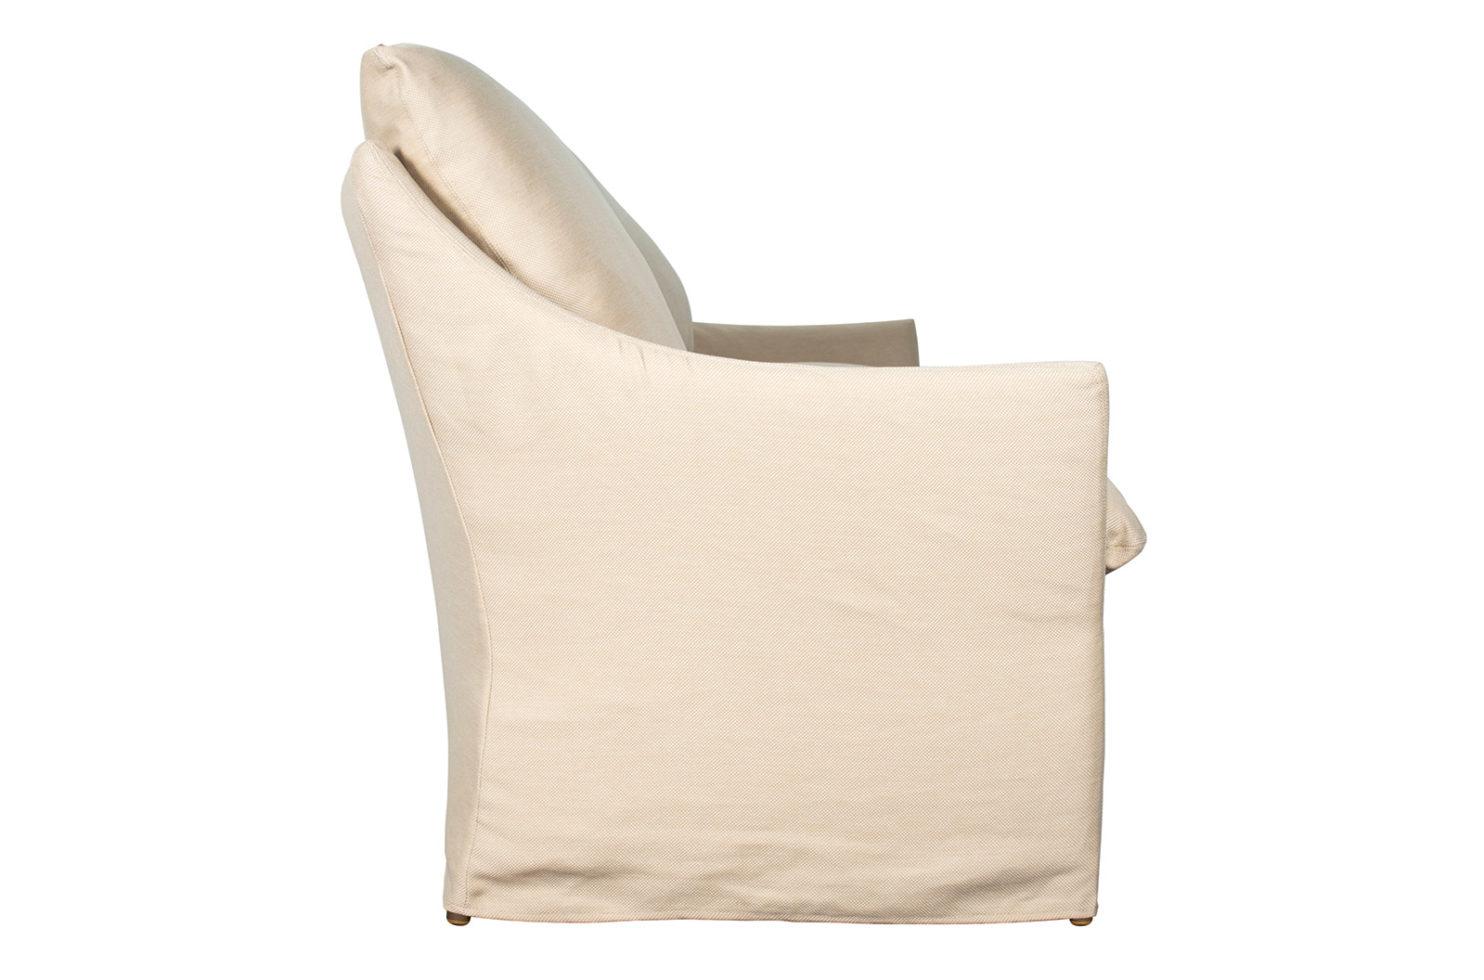 capri sofa 620FT094FC PW 1 side